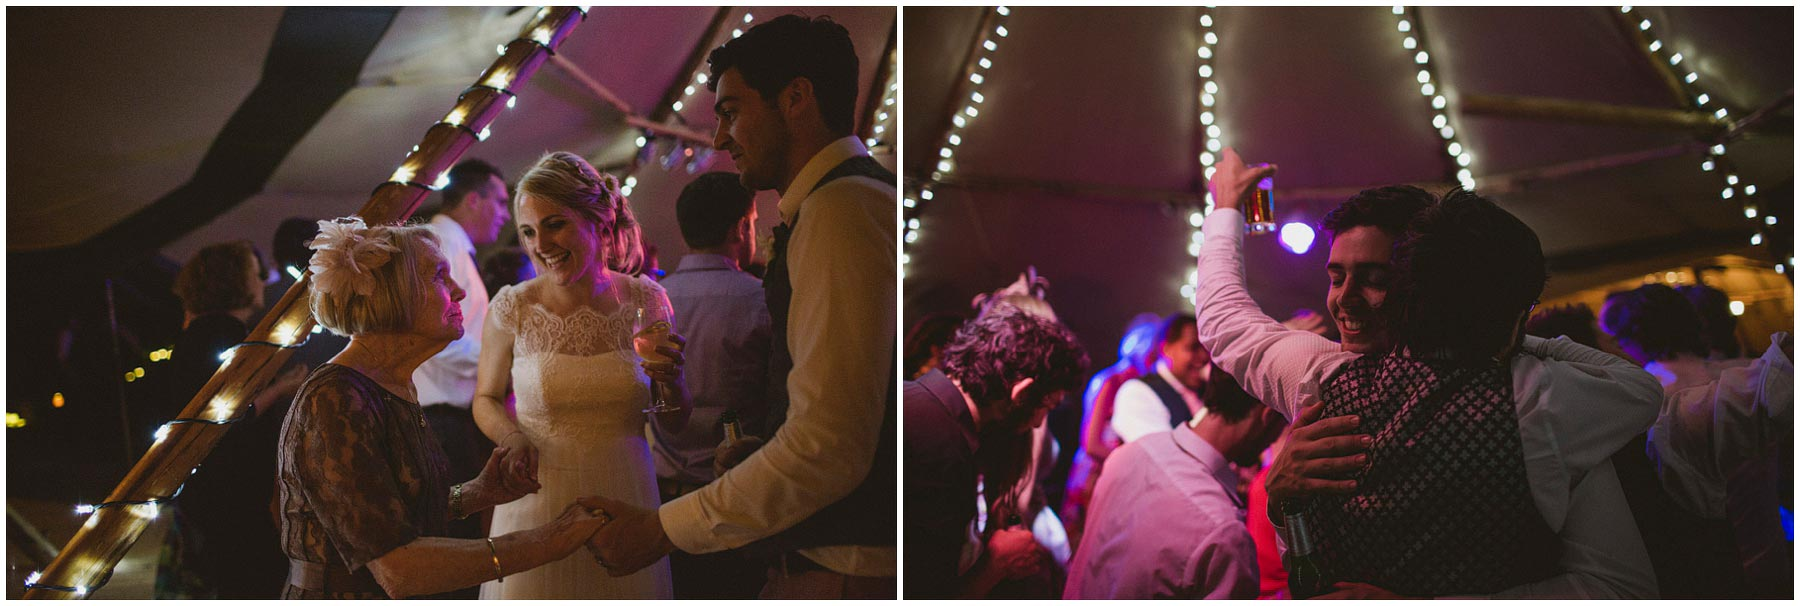 Kent-Festival-Tipi-wedding-photography_0201